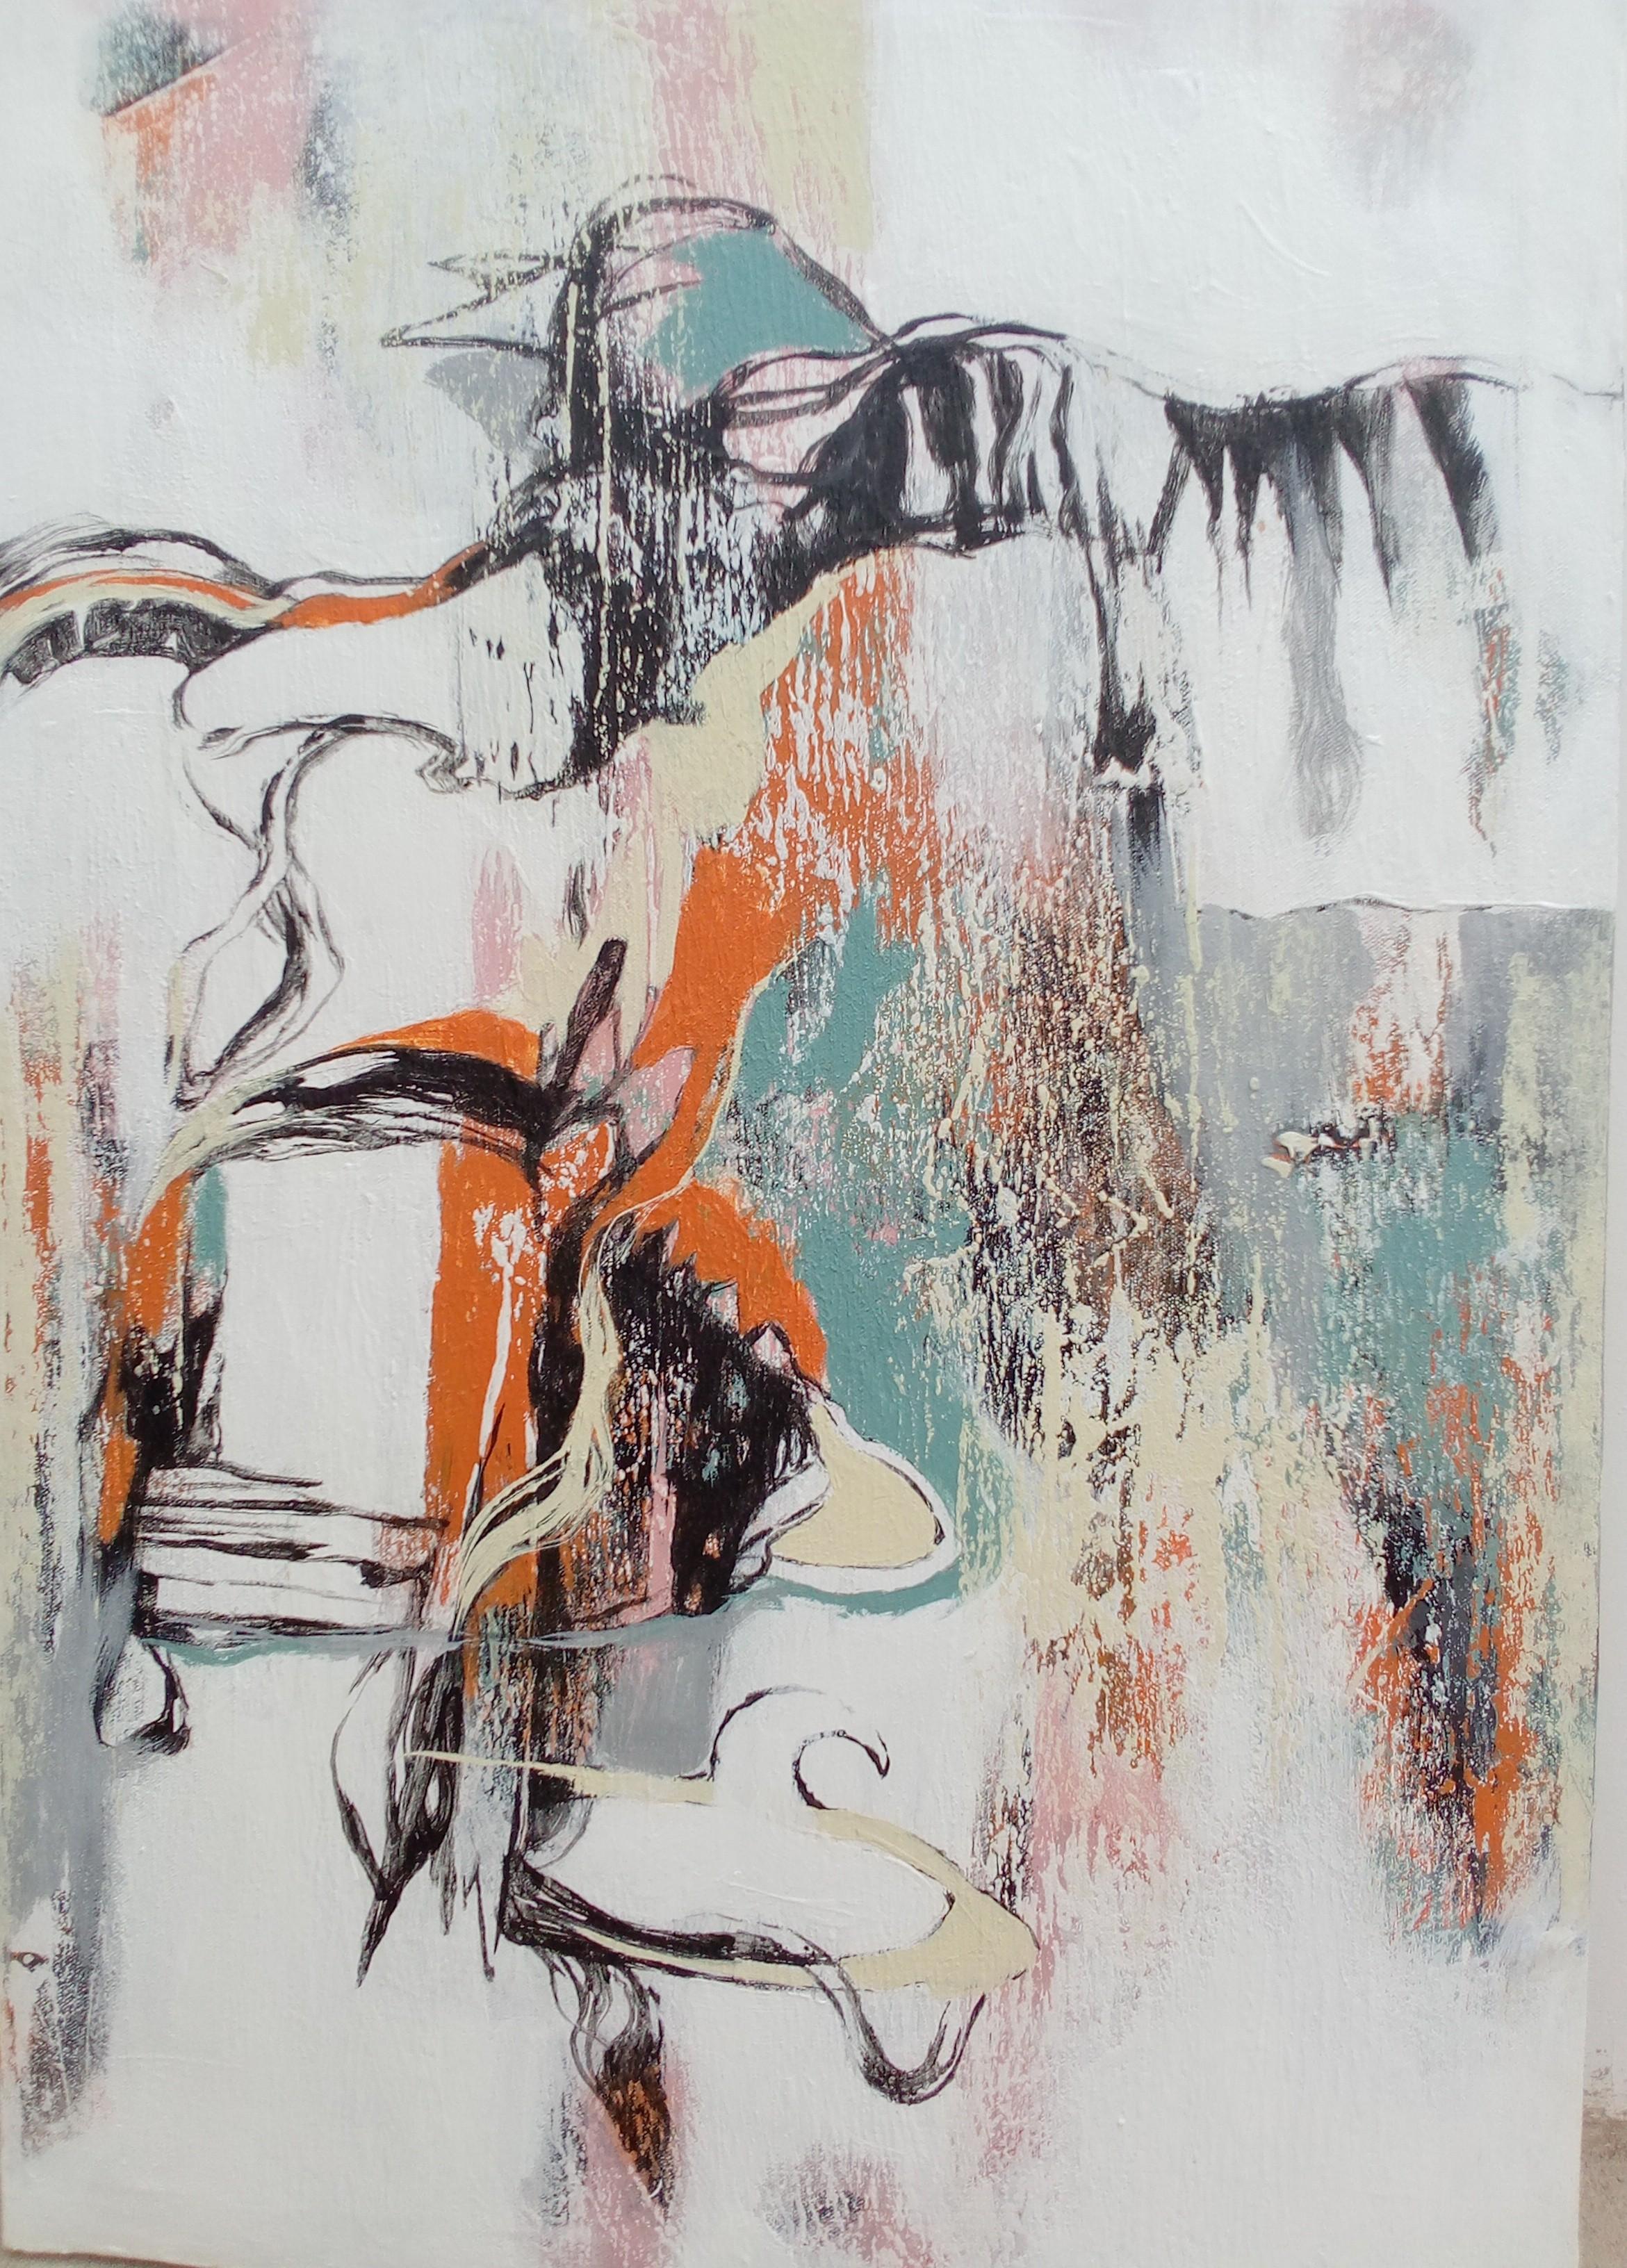 moods -3 by Sanjeewa Gunasinghe